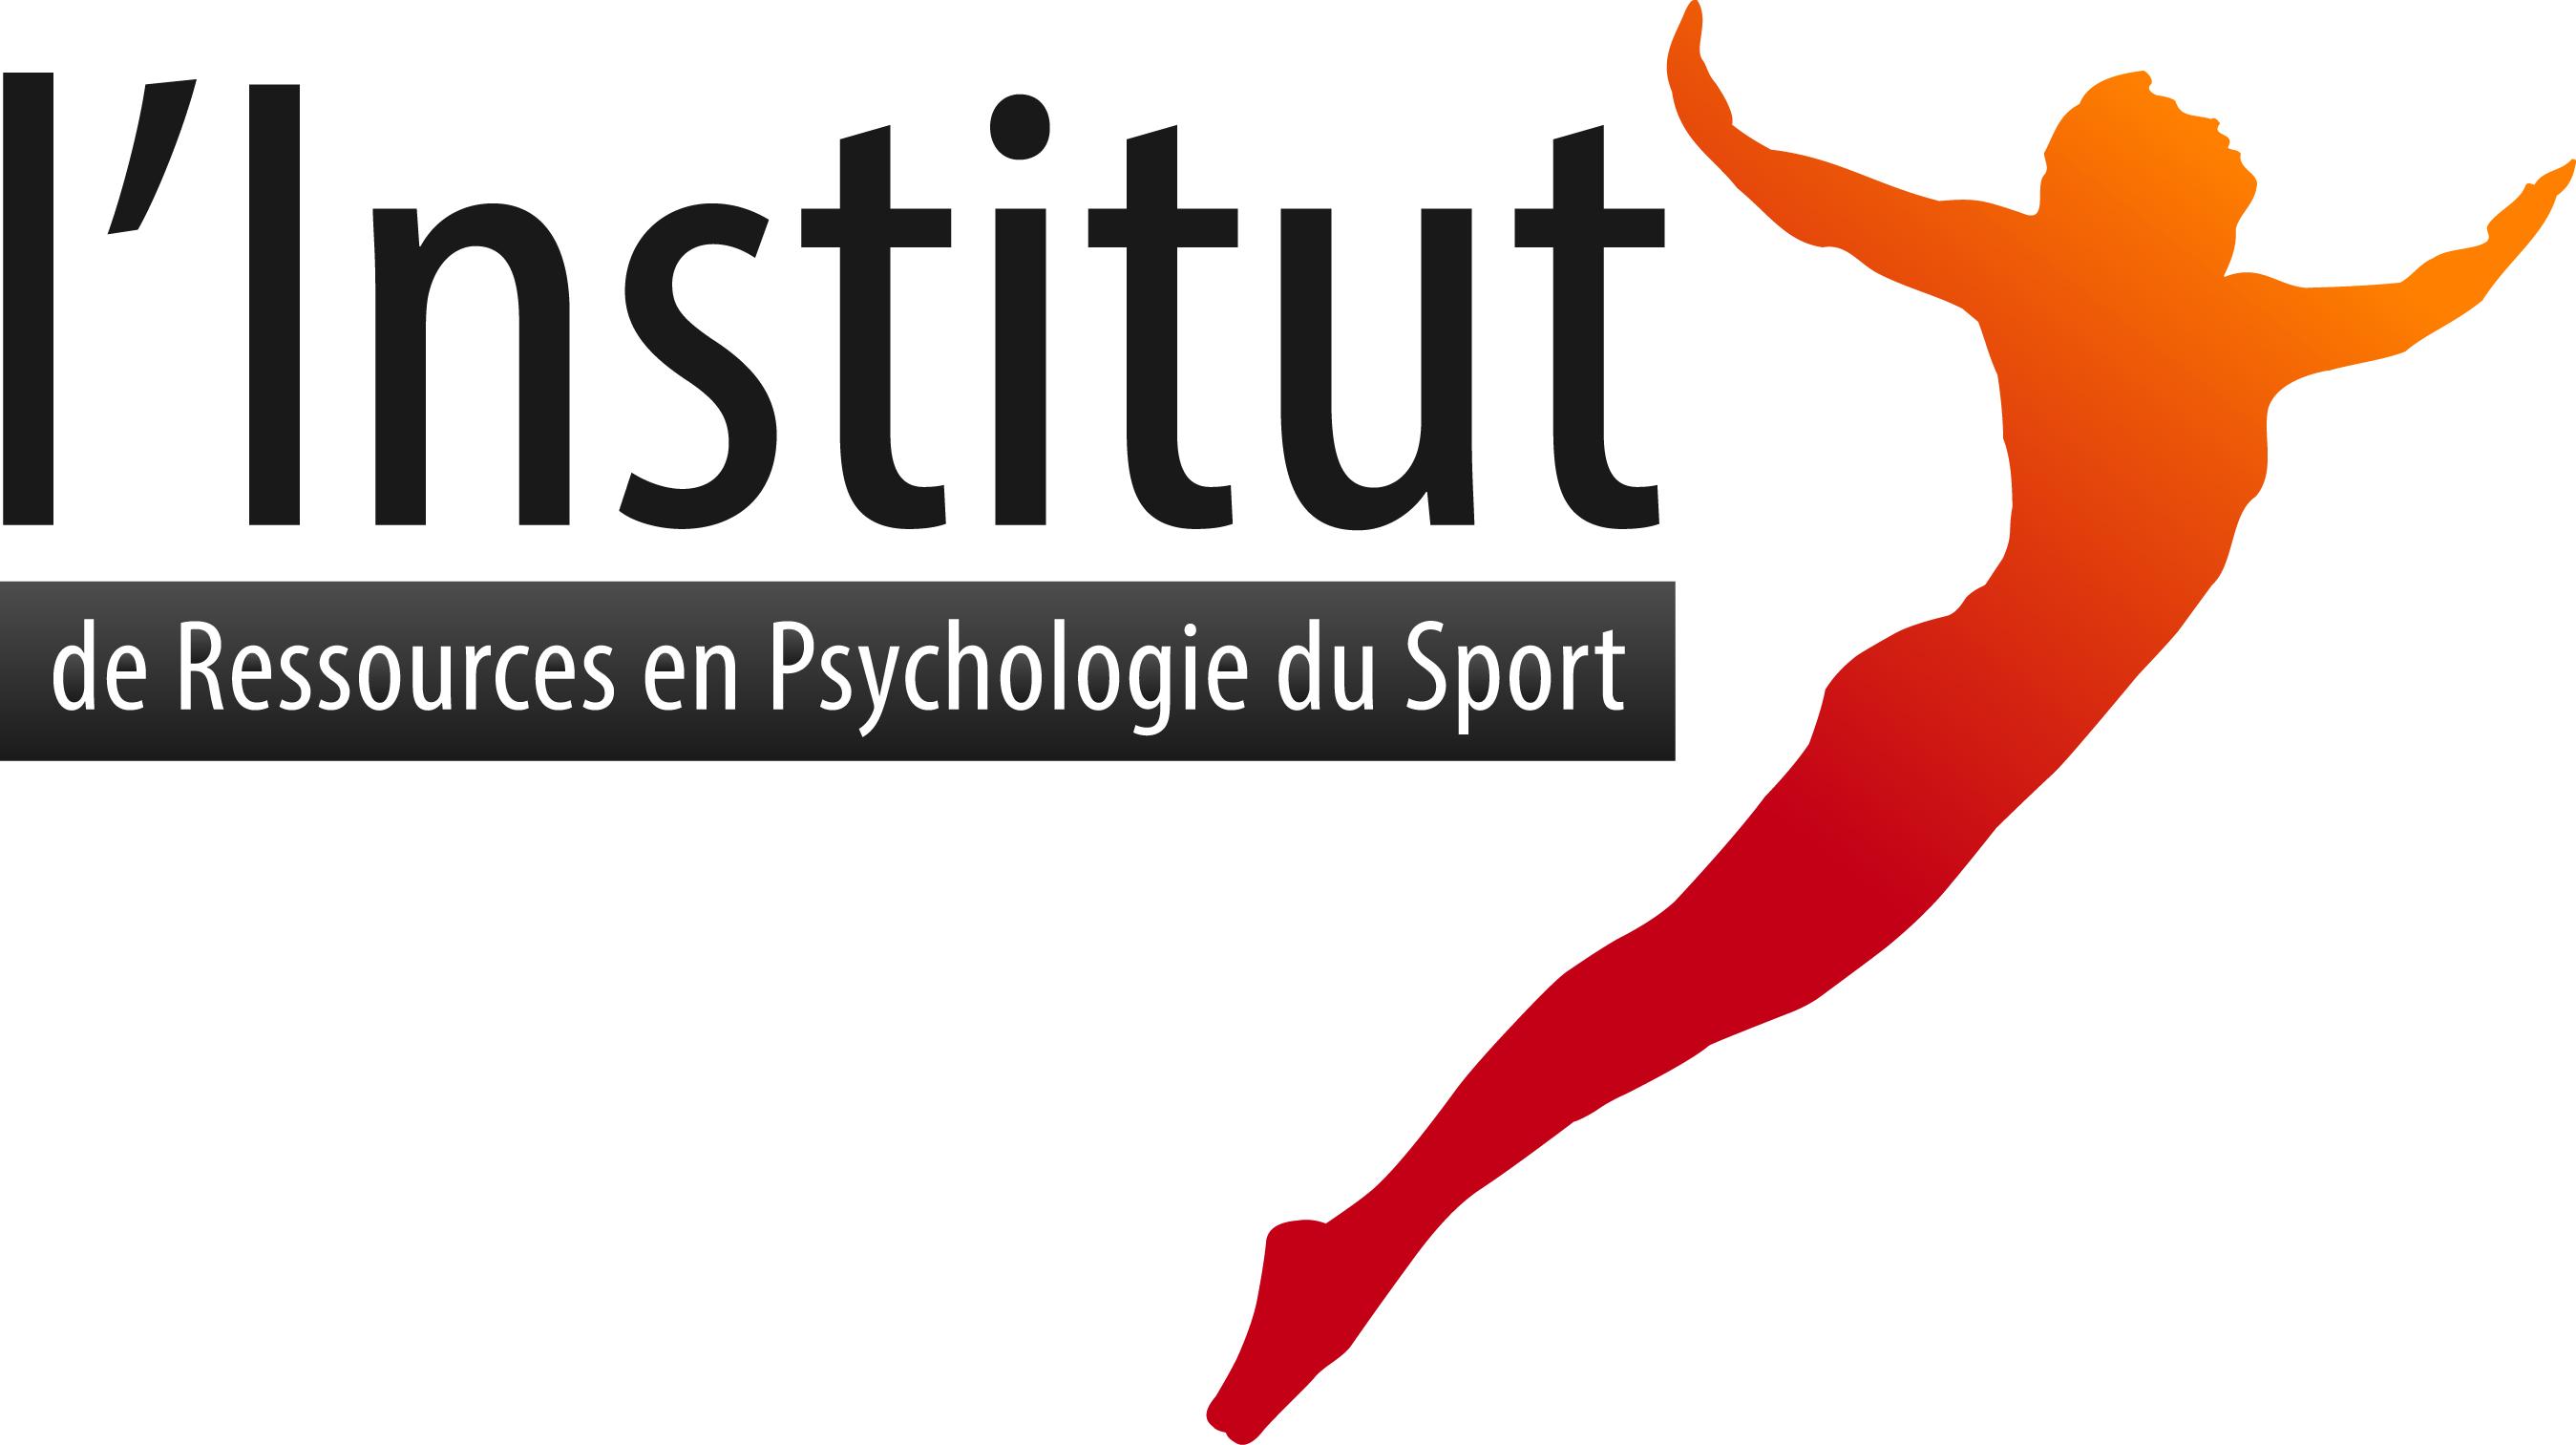 Institut de Ressources en Psychologie du Sport